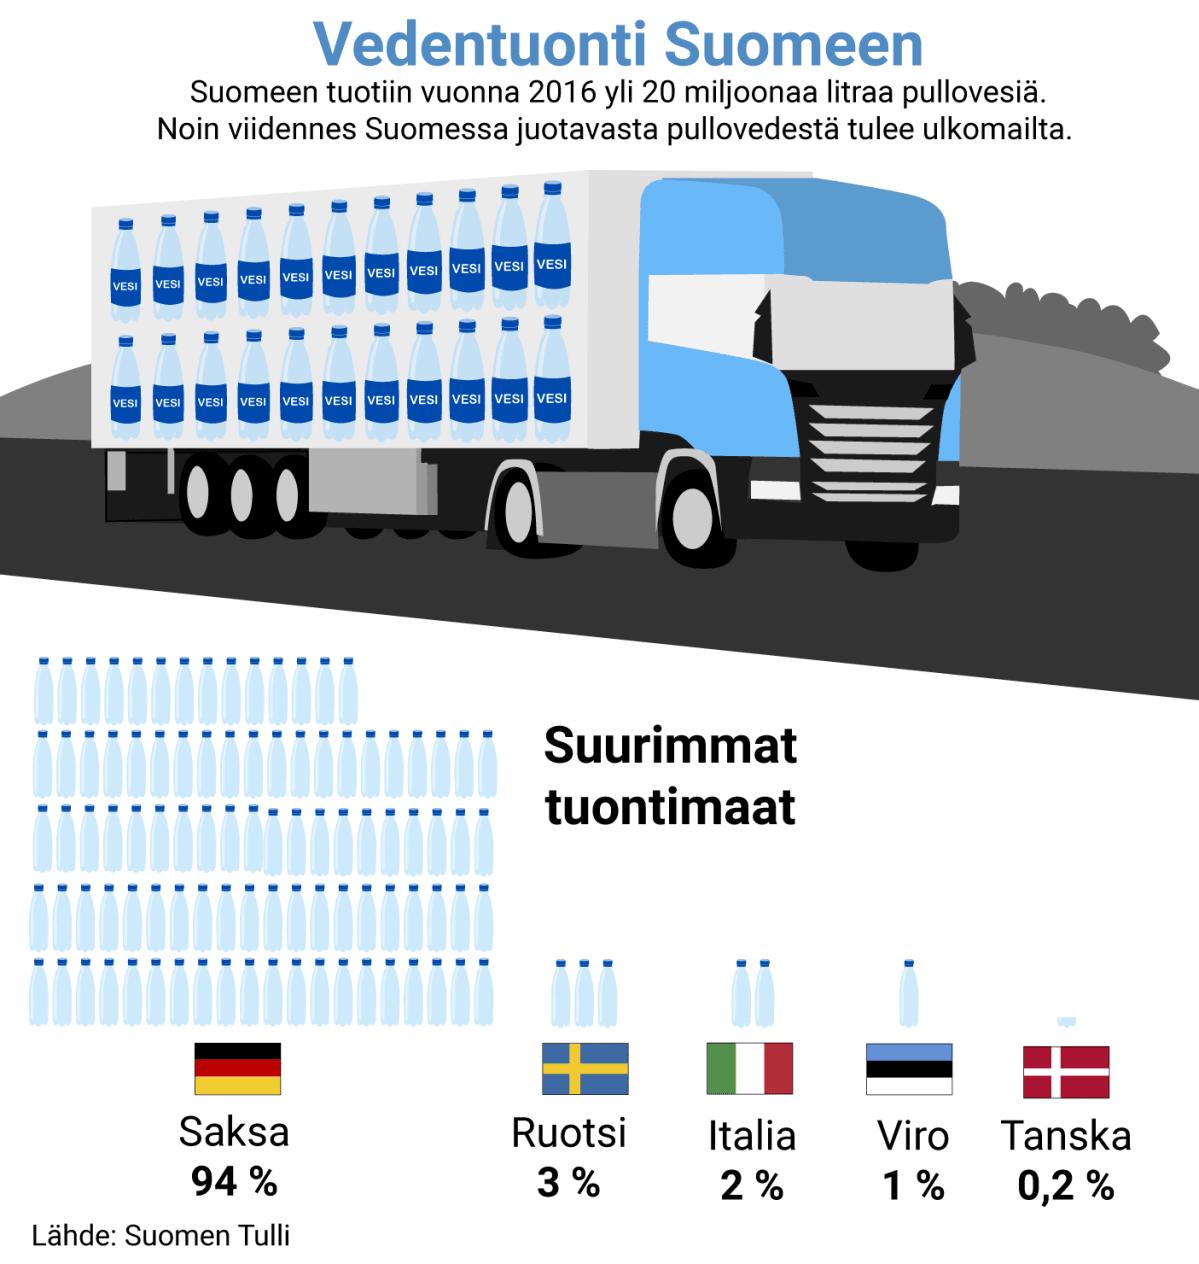 Vedentuonti Suomeen